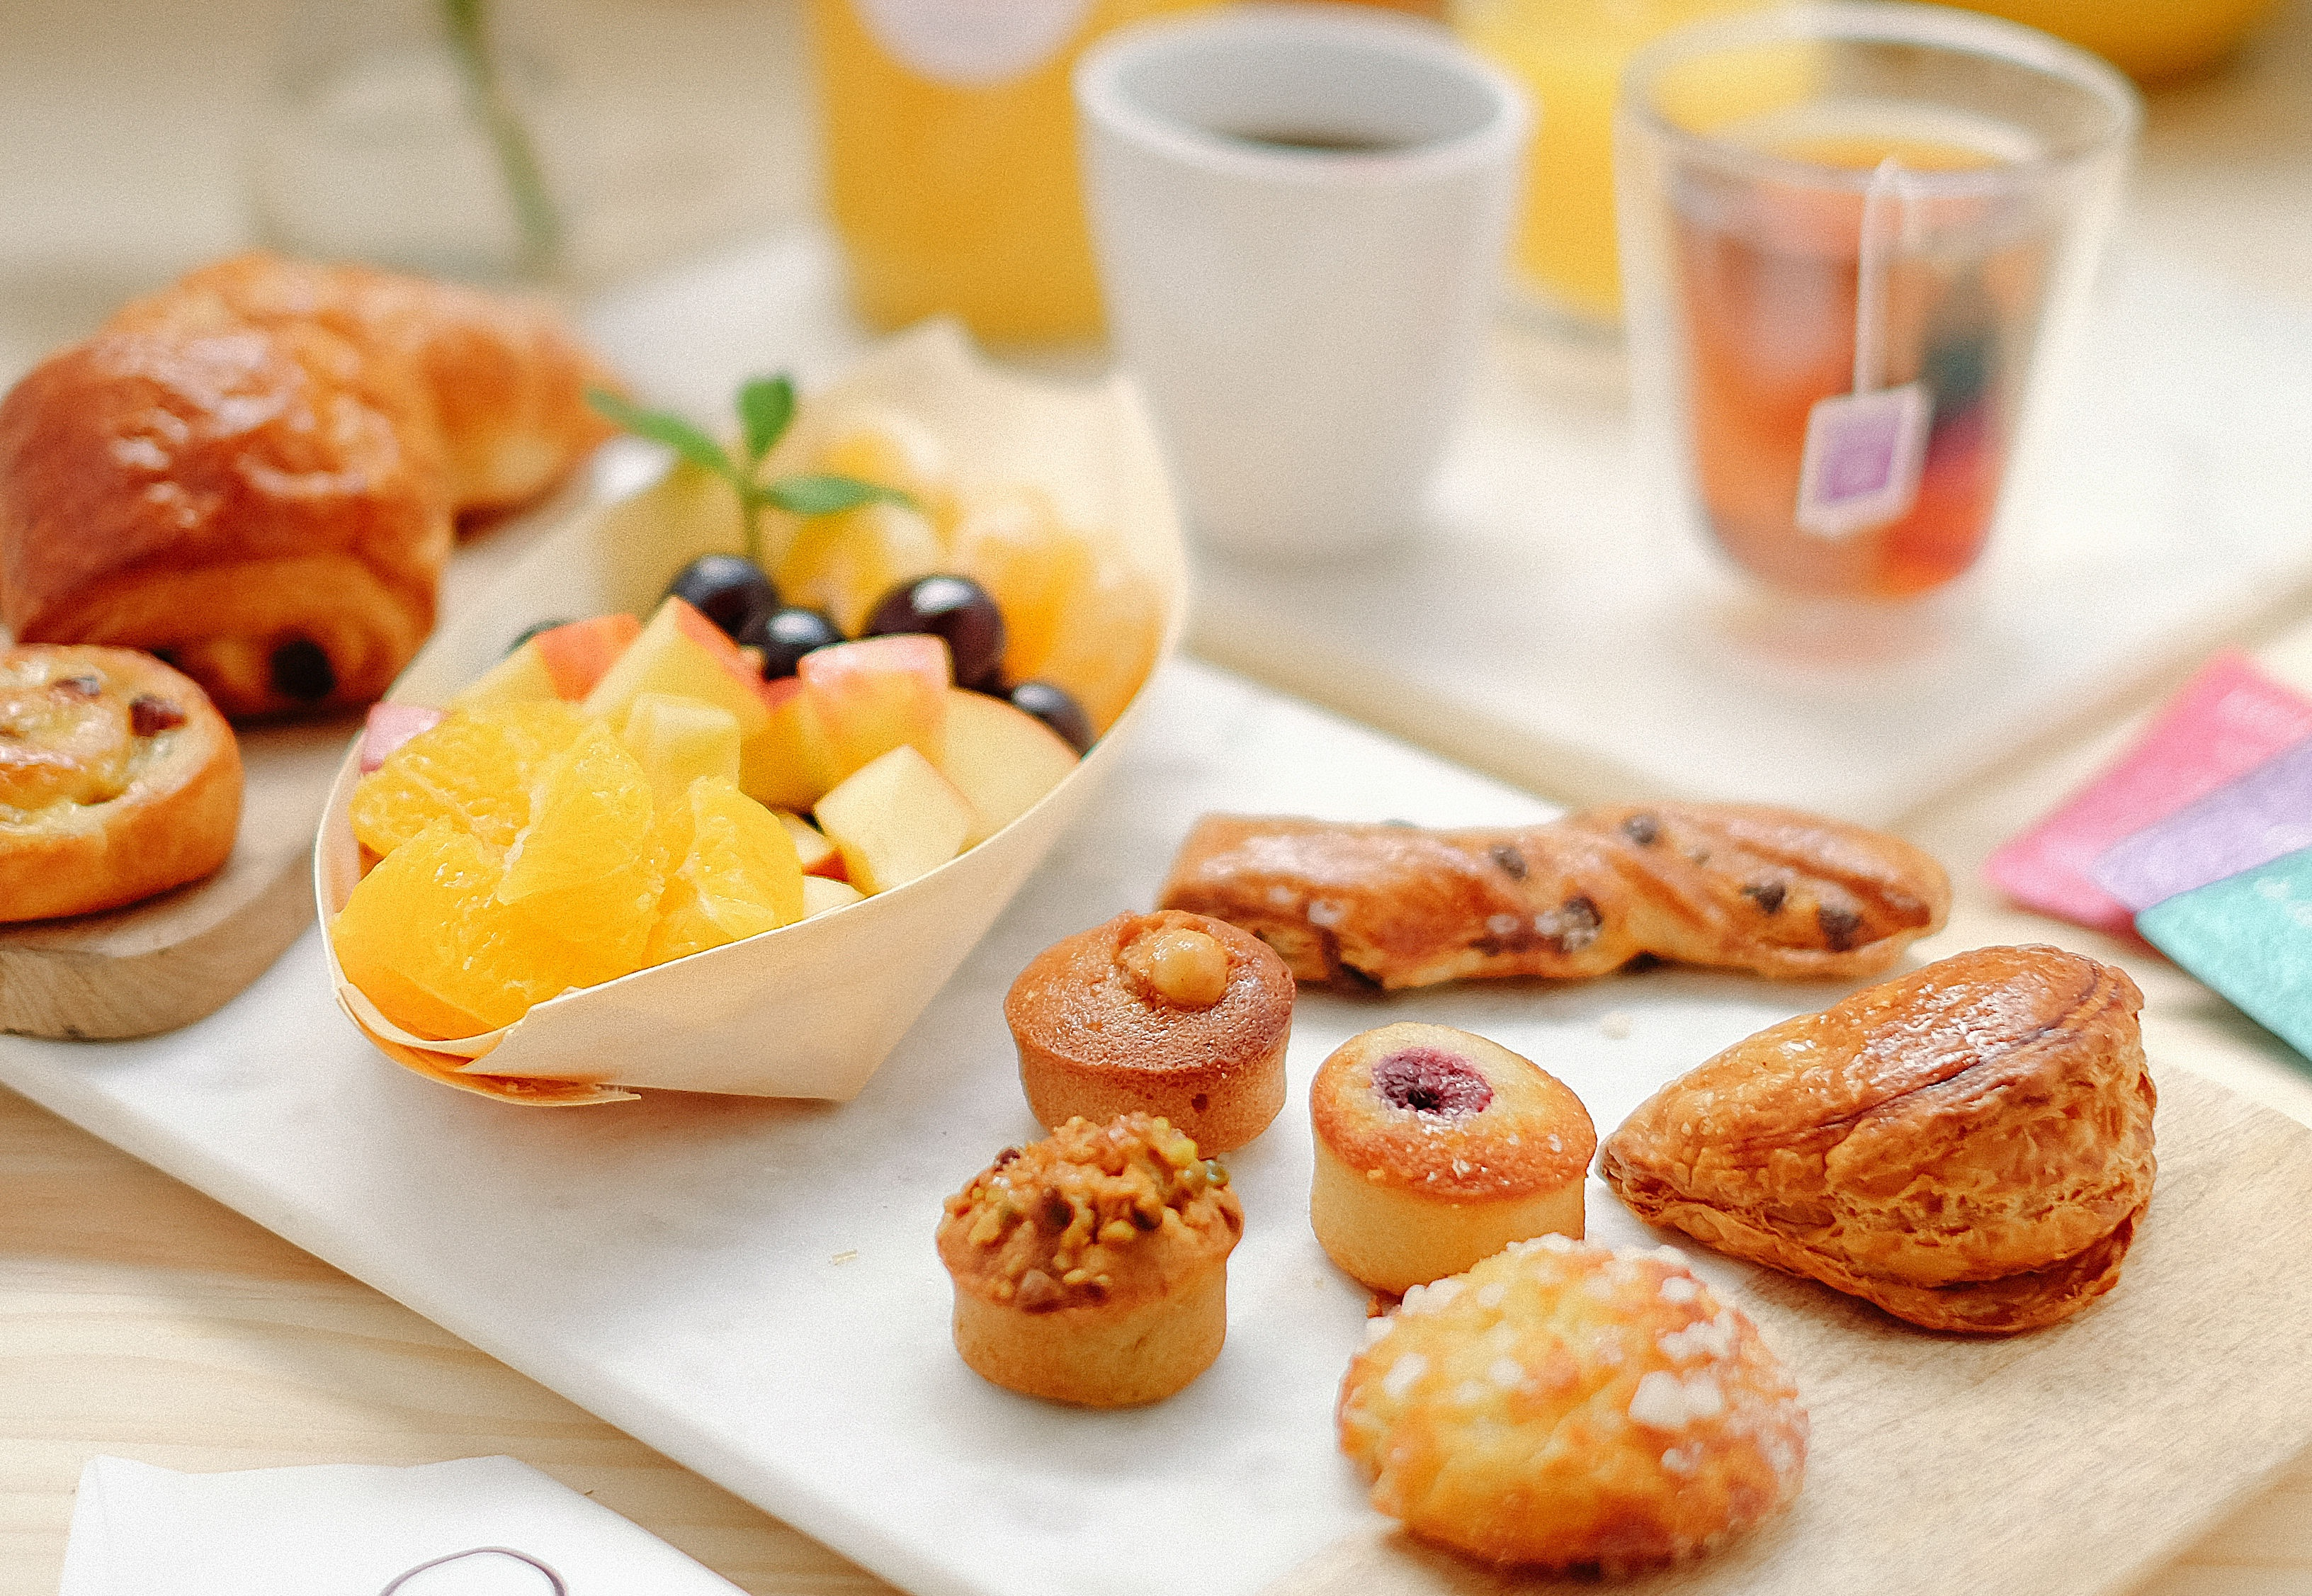 SnapEvent-Menus-Petit-dejeuner-gourmand-58363